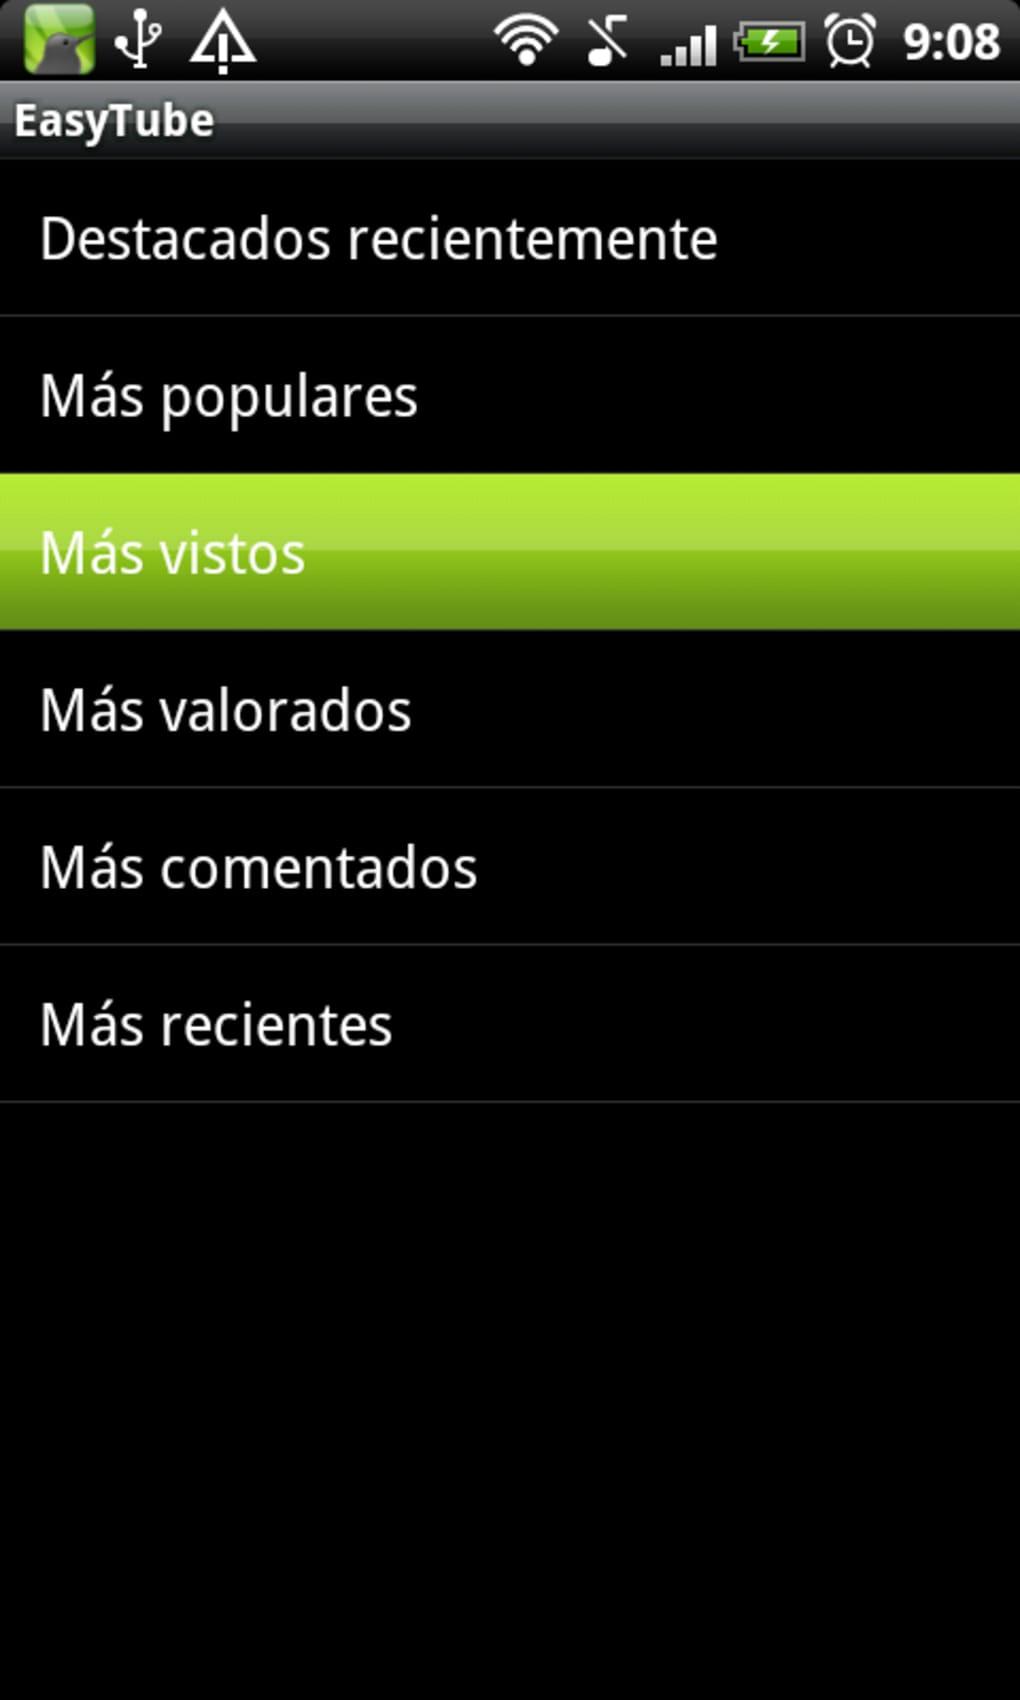 videos xxyyxx en español youtube vi android descargar videos